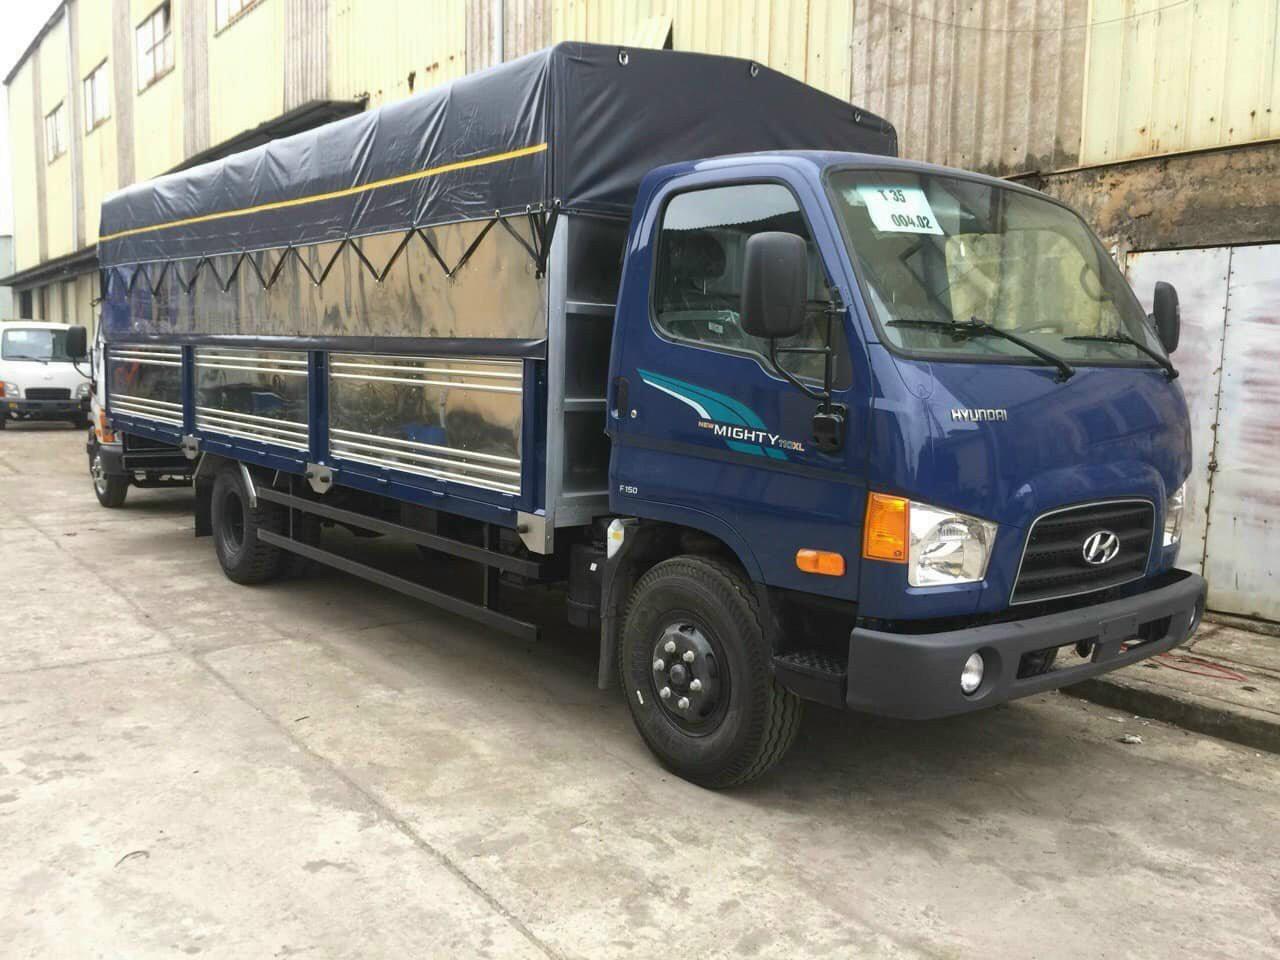 Bán xe tải Hyundai 110XL tại Phú Thọ